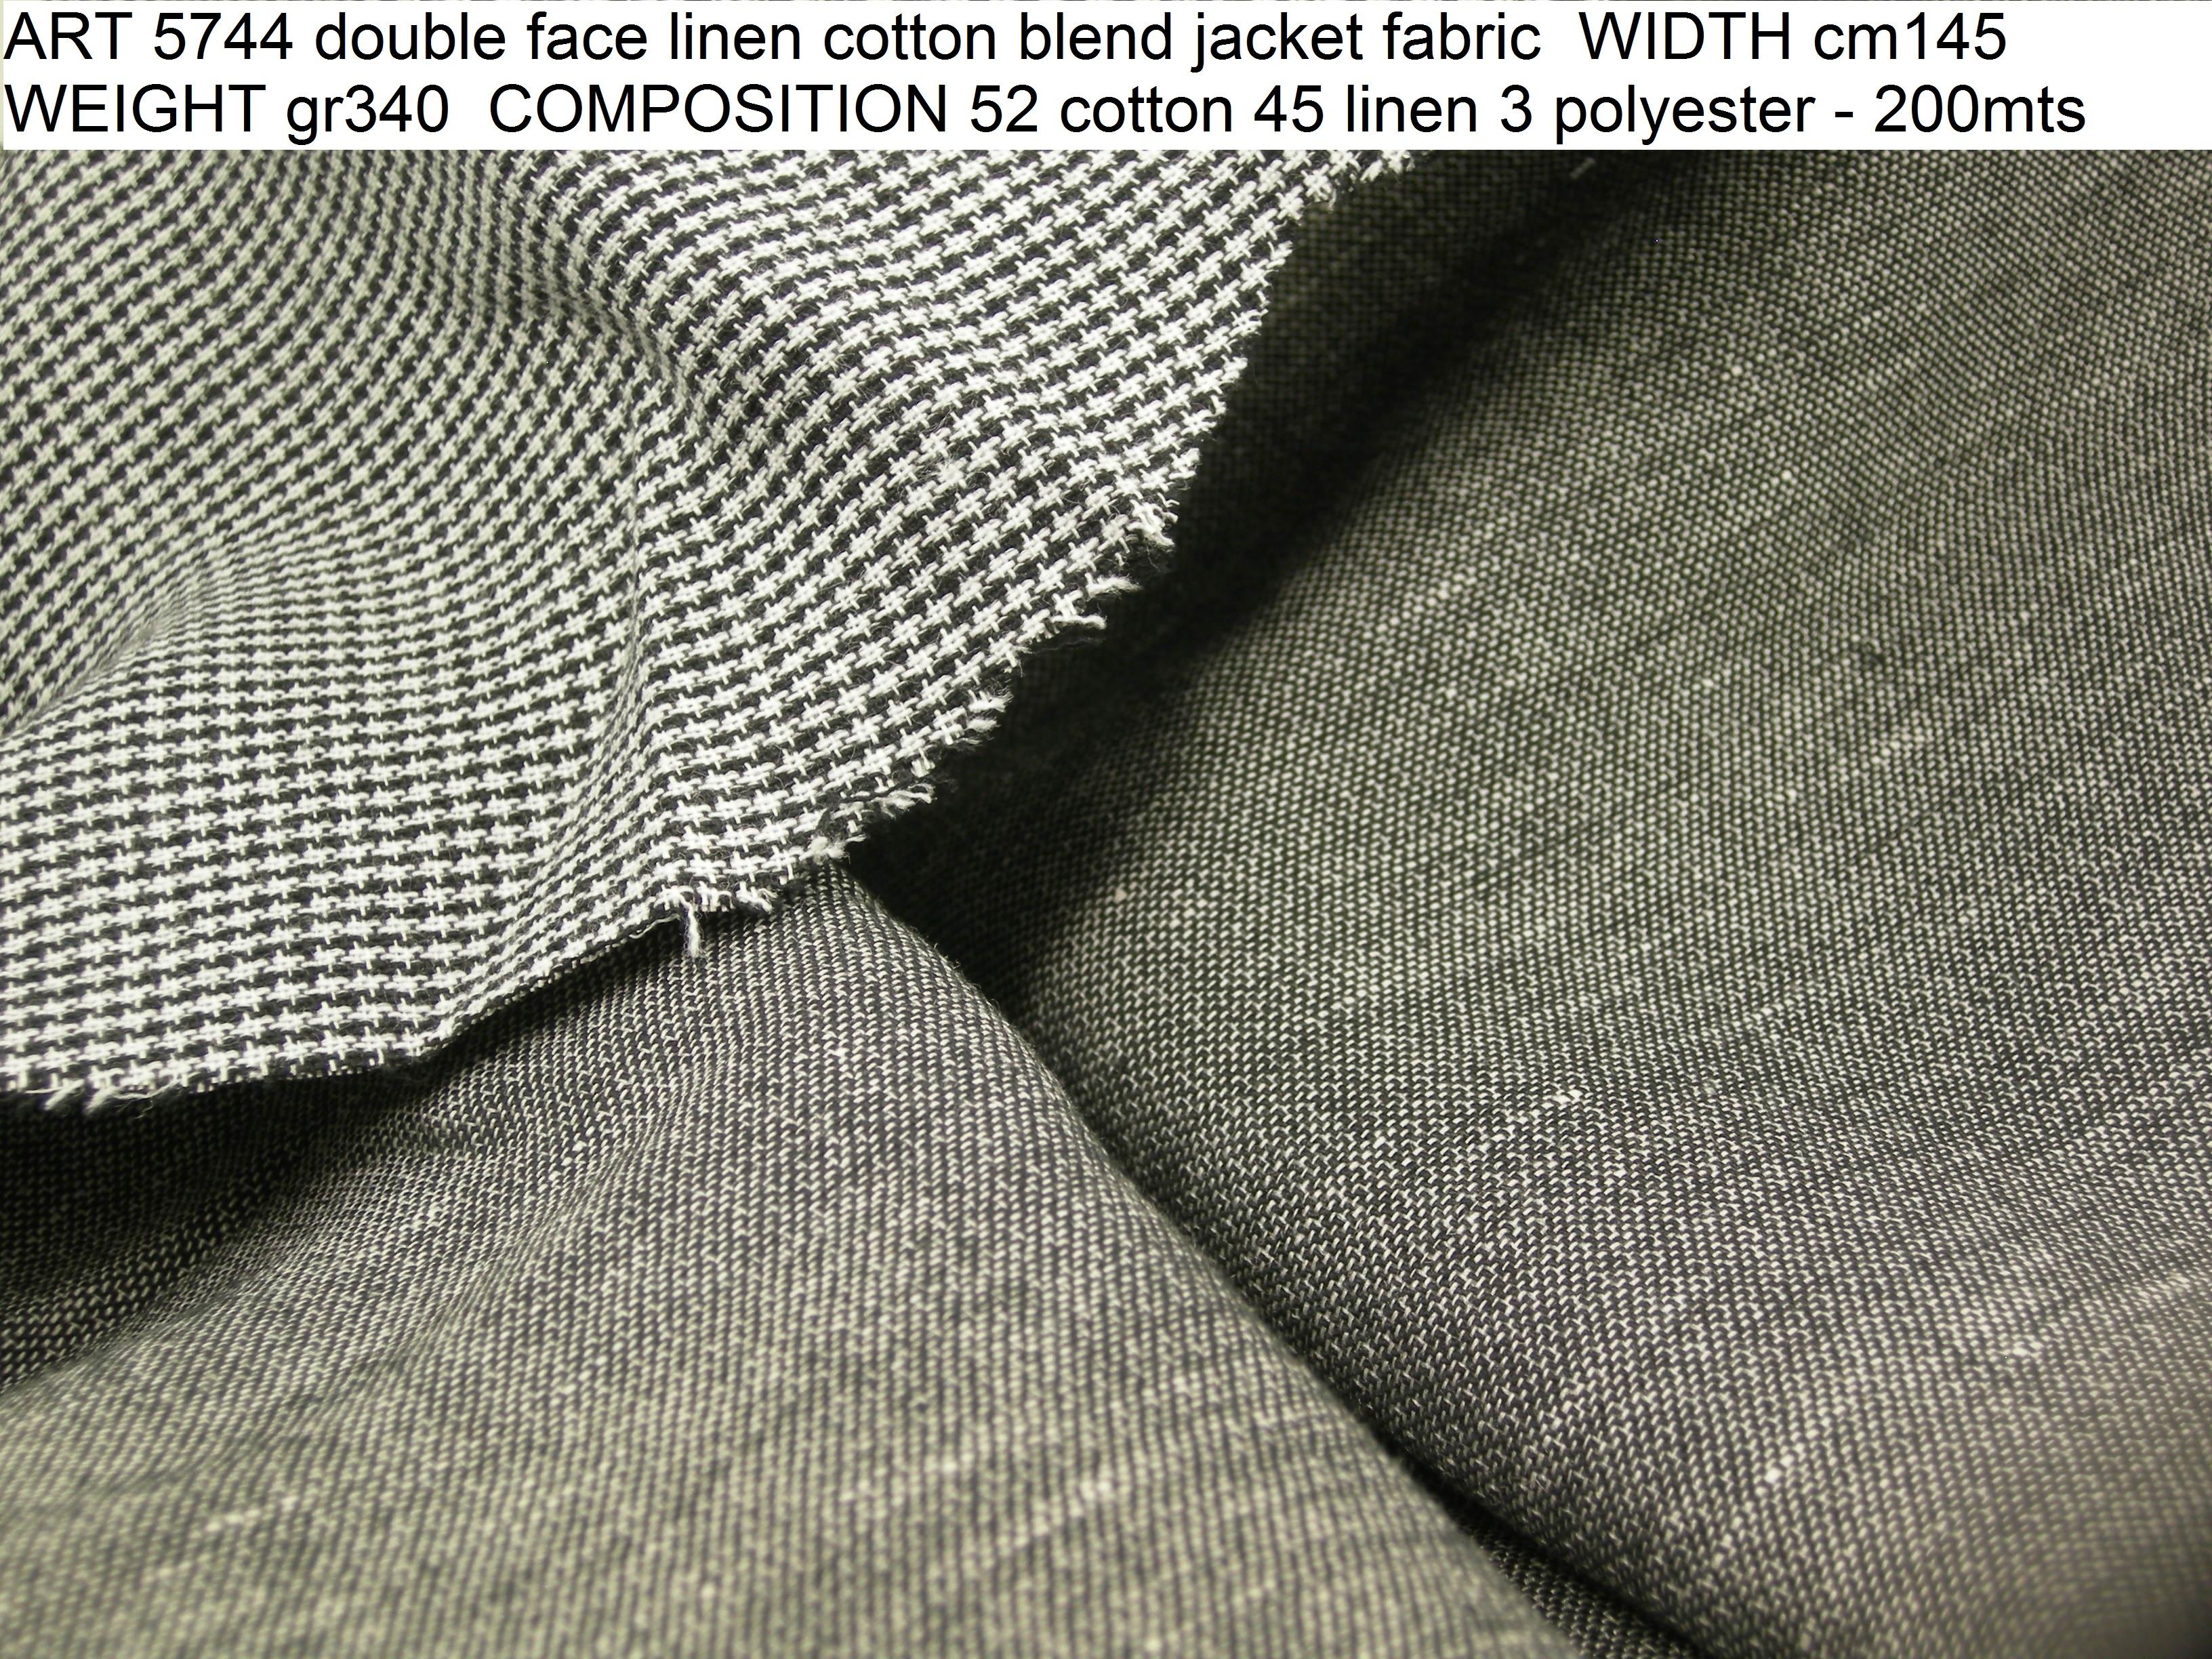 ART 5744 double face linen cotton blend jacket fabric WIDTH cm145 WEIGHT gr340 COMPOSITION 52 cotton 45 linen 3 polyester - 200mts